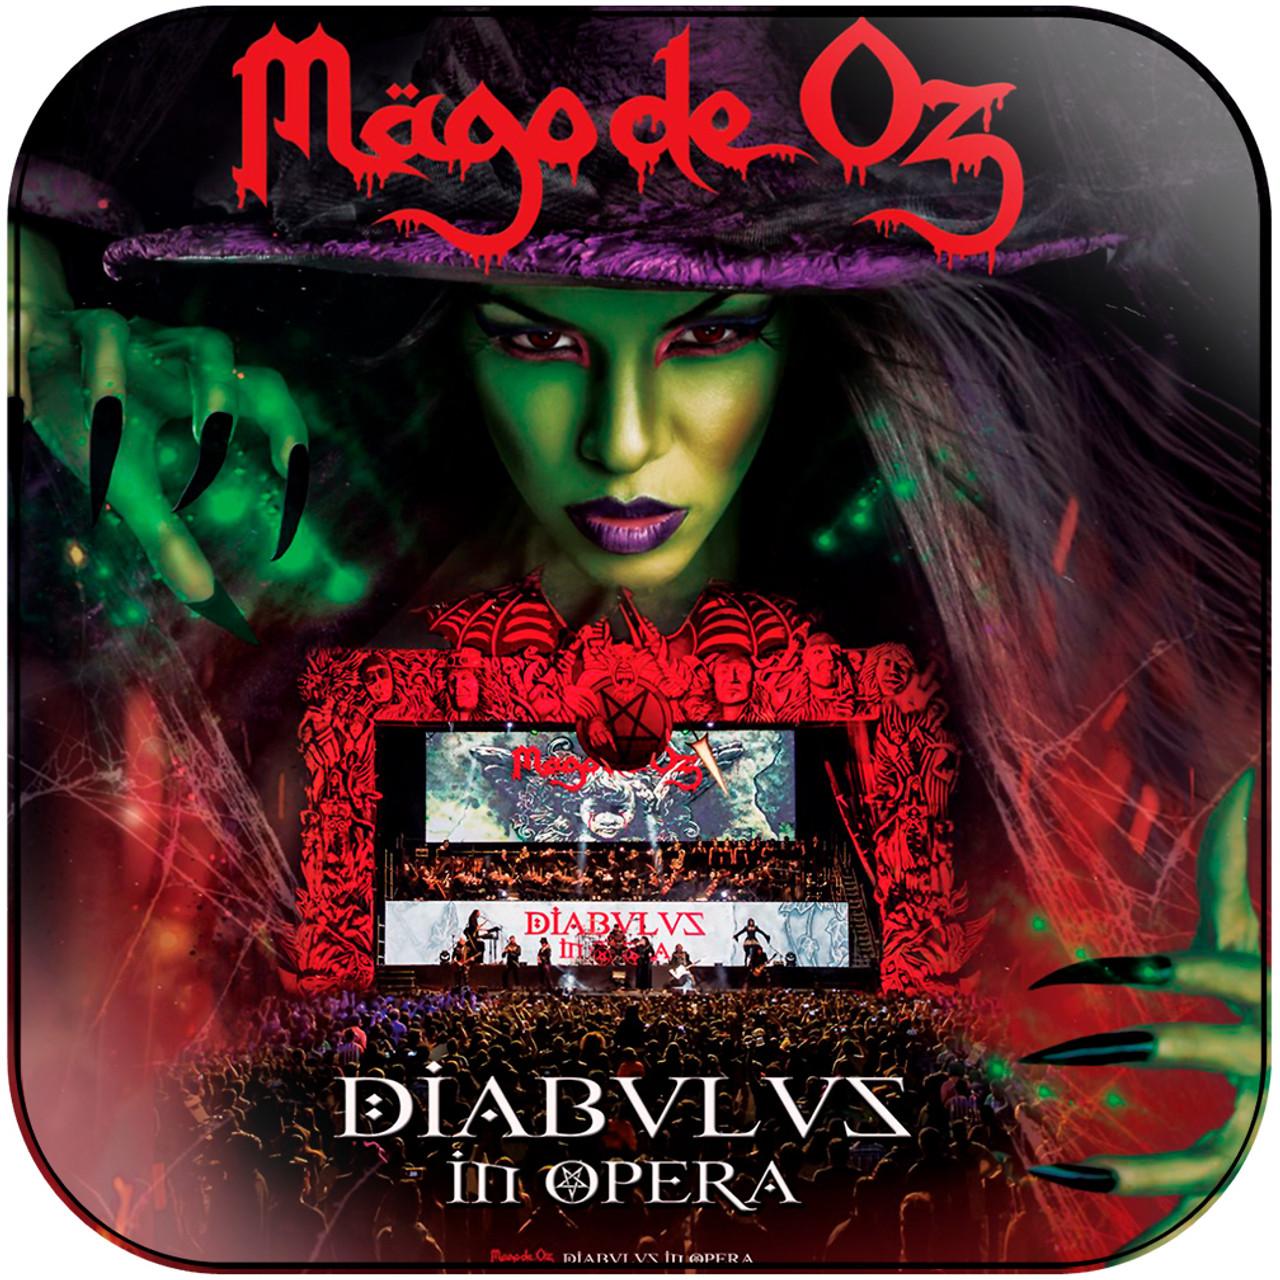 Mago De Oz Diabulus In Opera Album Cover Sticker